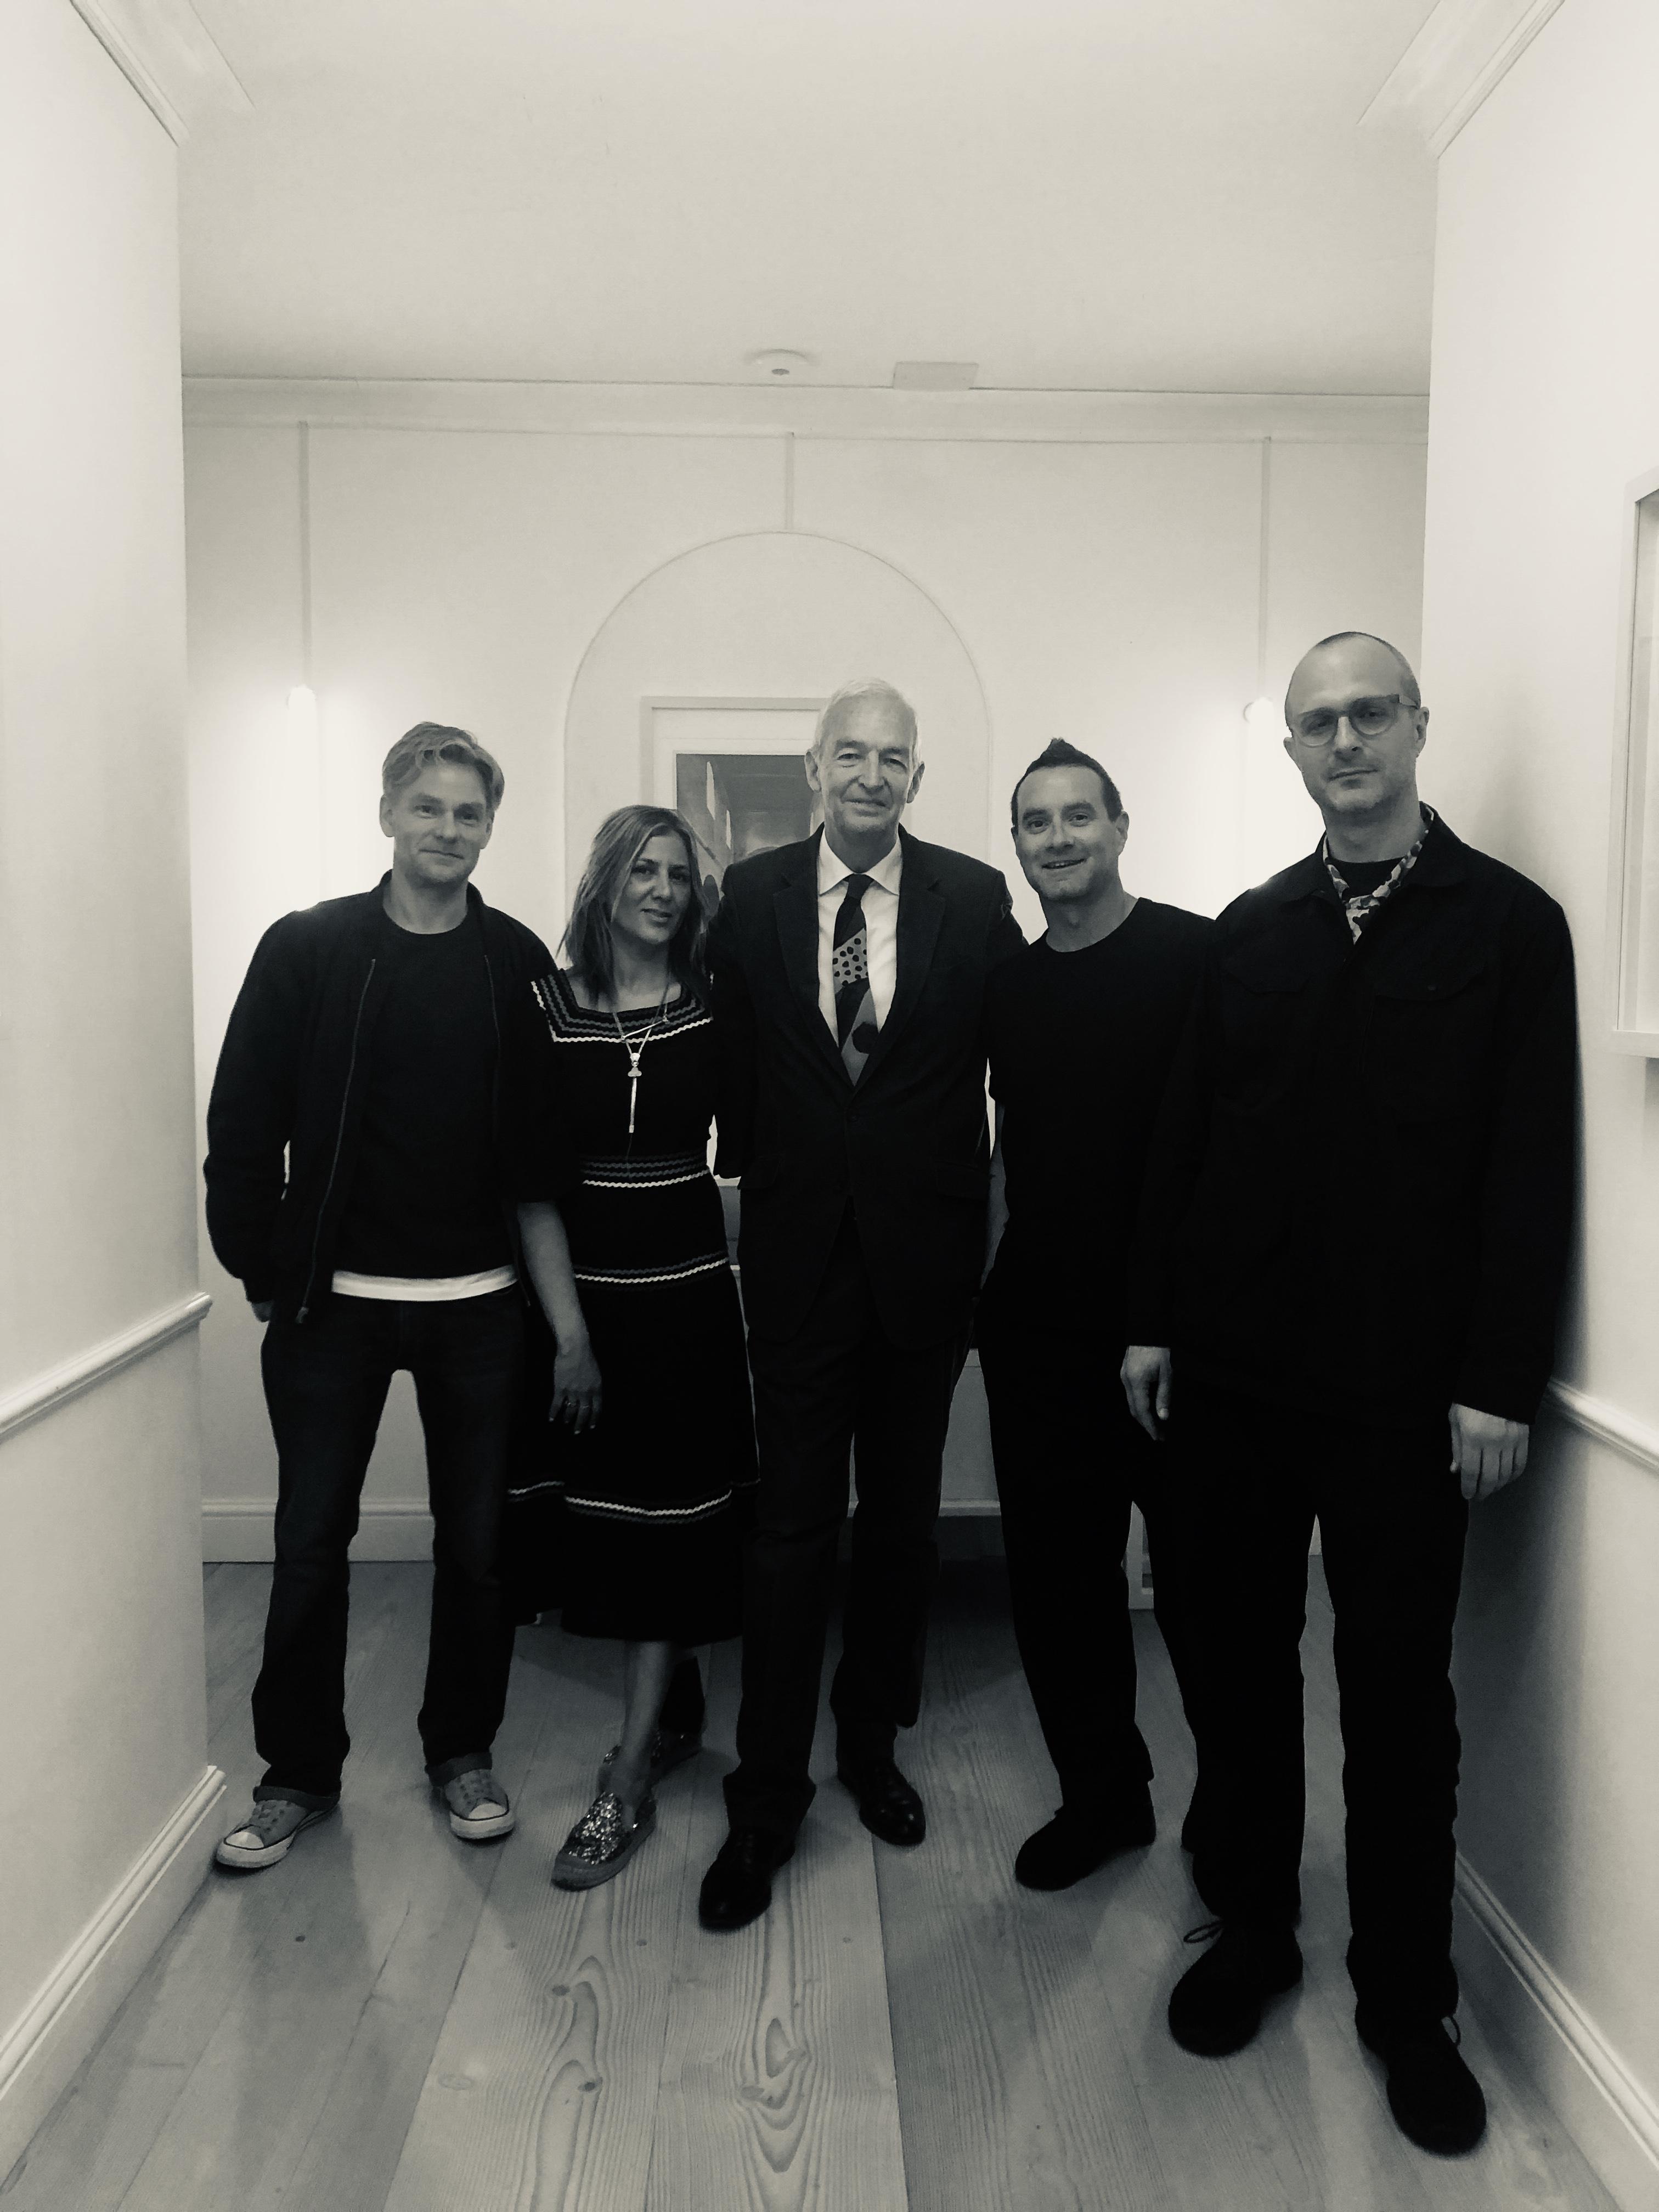 Beyond The Road (l-r) Colin Nightingale, Azzi Glasser, James Lavelle, Stephen Dobbie with Jon Snow